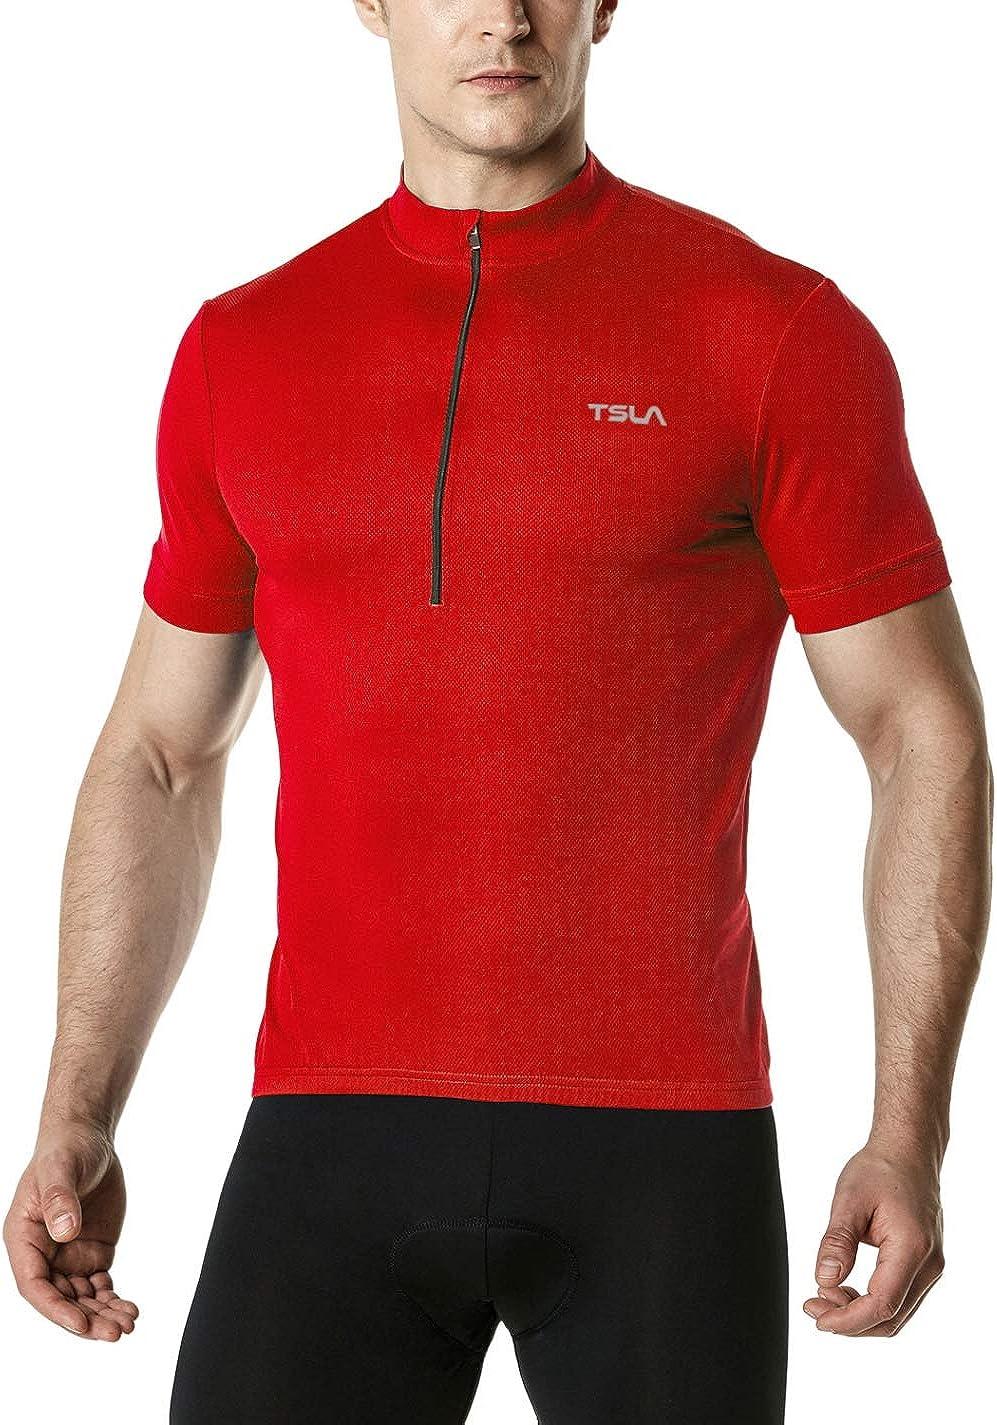 TSLA Men's Short Sleeve Bike Cycling Jersey, Quick Dry Breathable Reflective Biking Shirts with 3 Rear Pockets